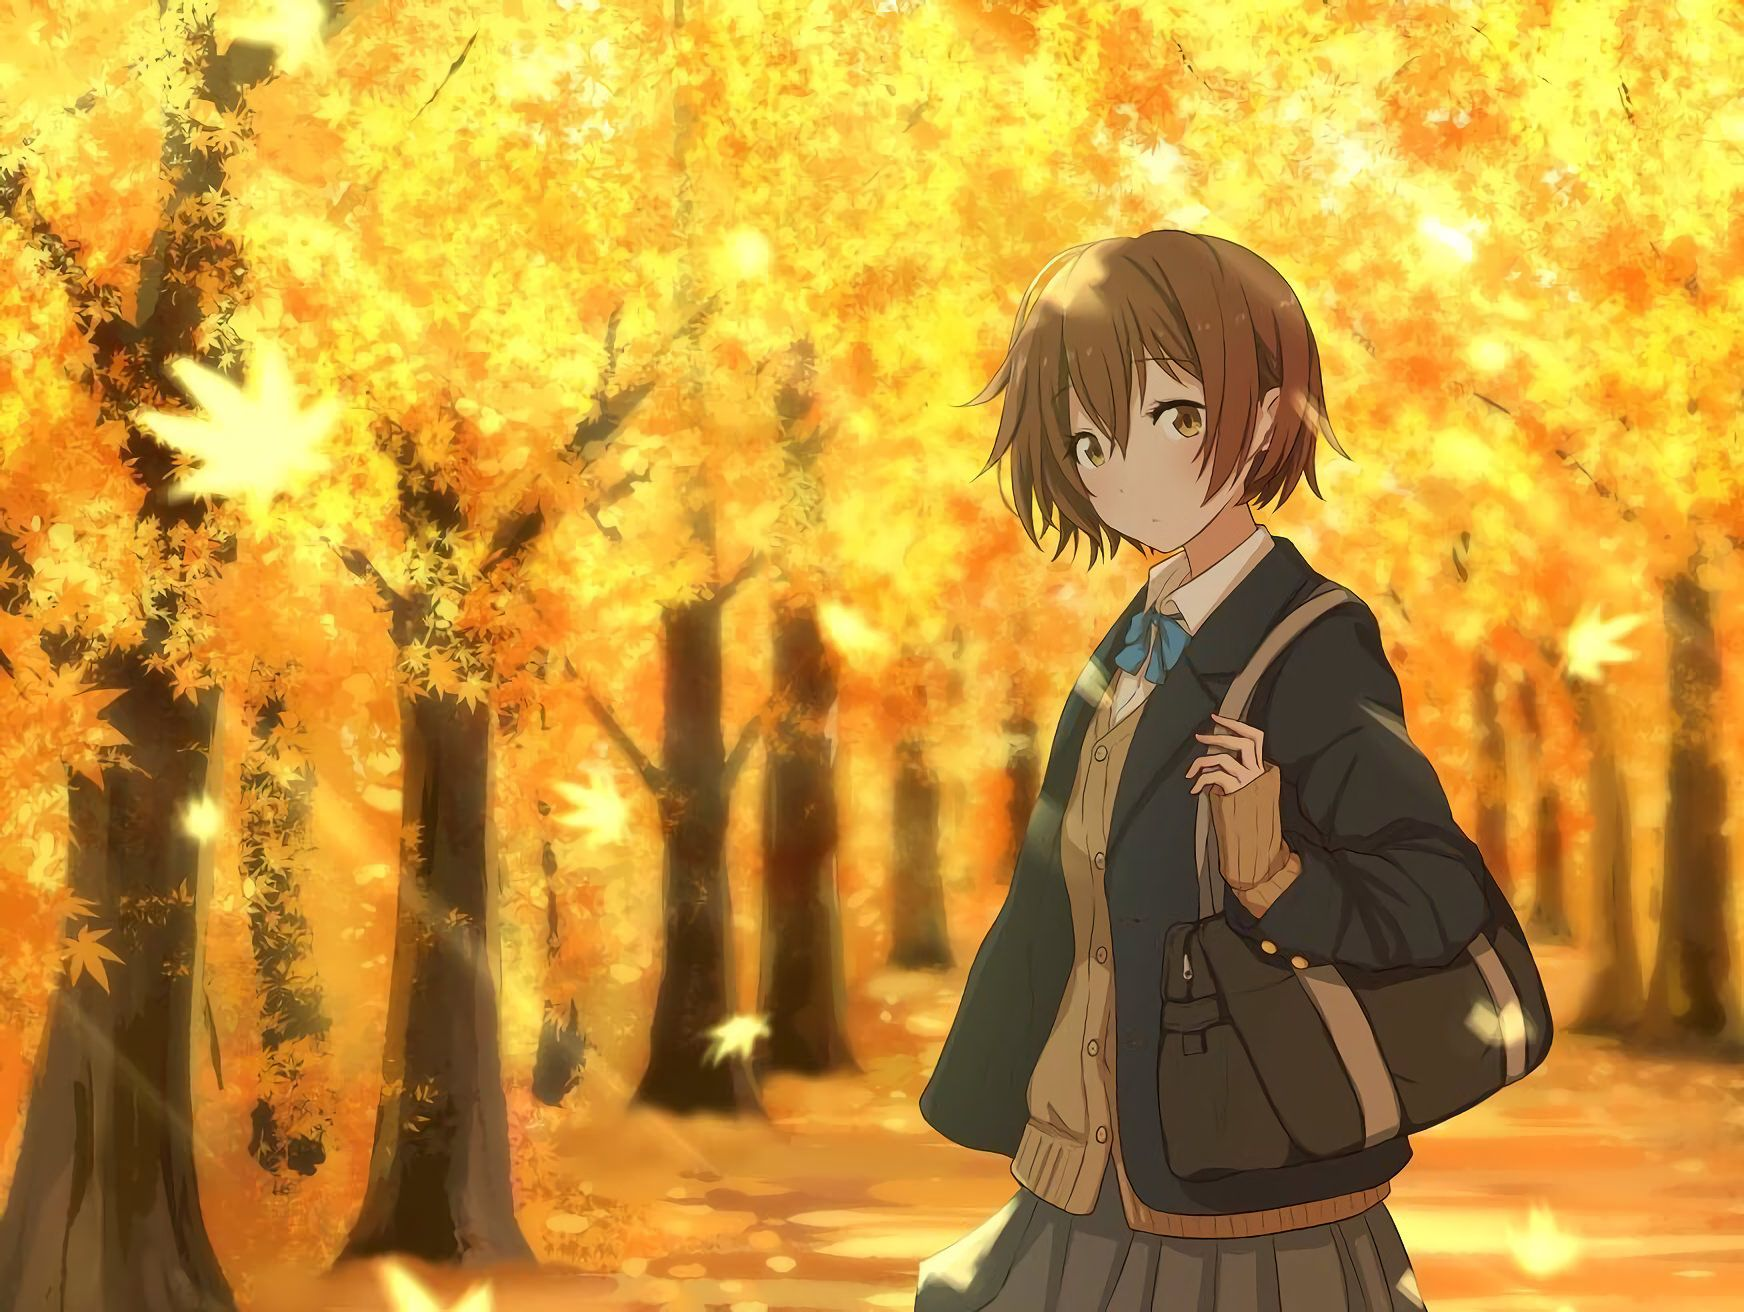 Yellow Autumn Original Anime Backgrounds Wallpapers Anime Scenery Wallpaper Anime Background